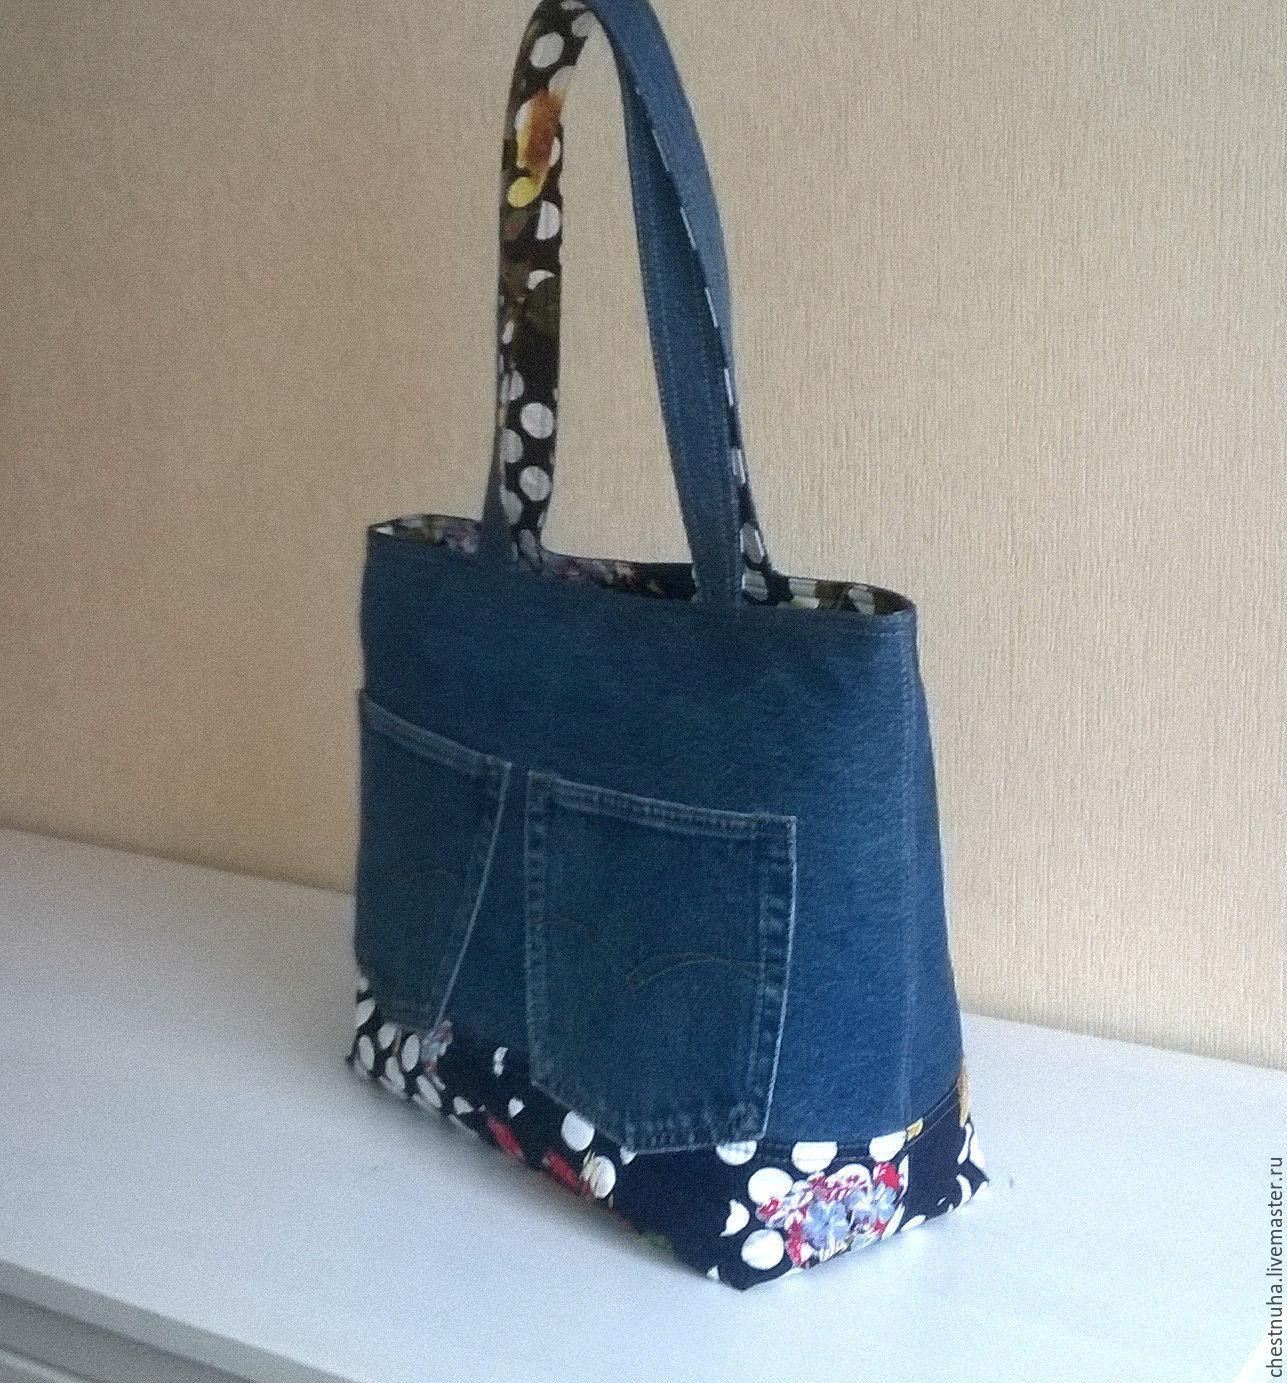 Сумка джинсовая женская Краски Холи_2, Женские сумки, Кострома, Фото №1